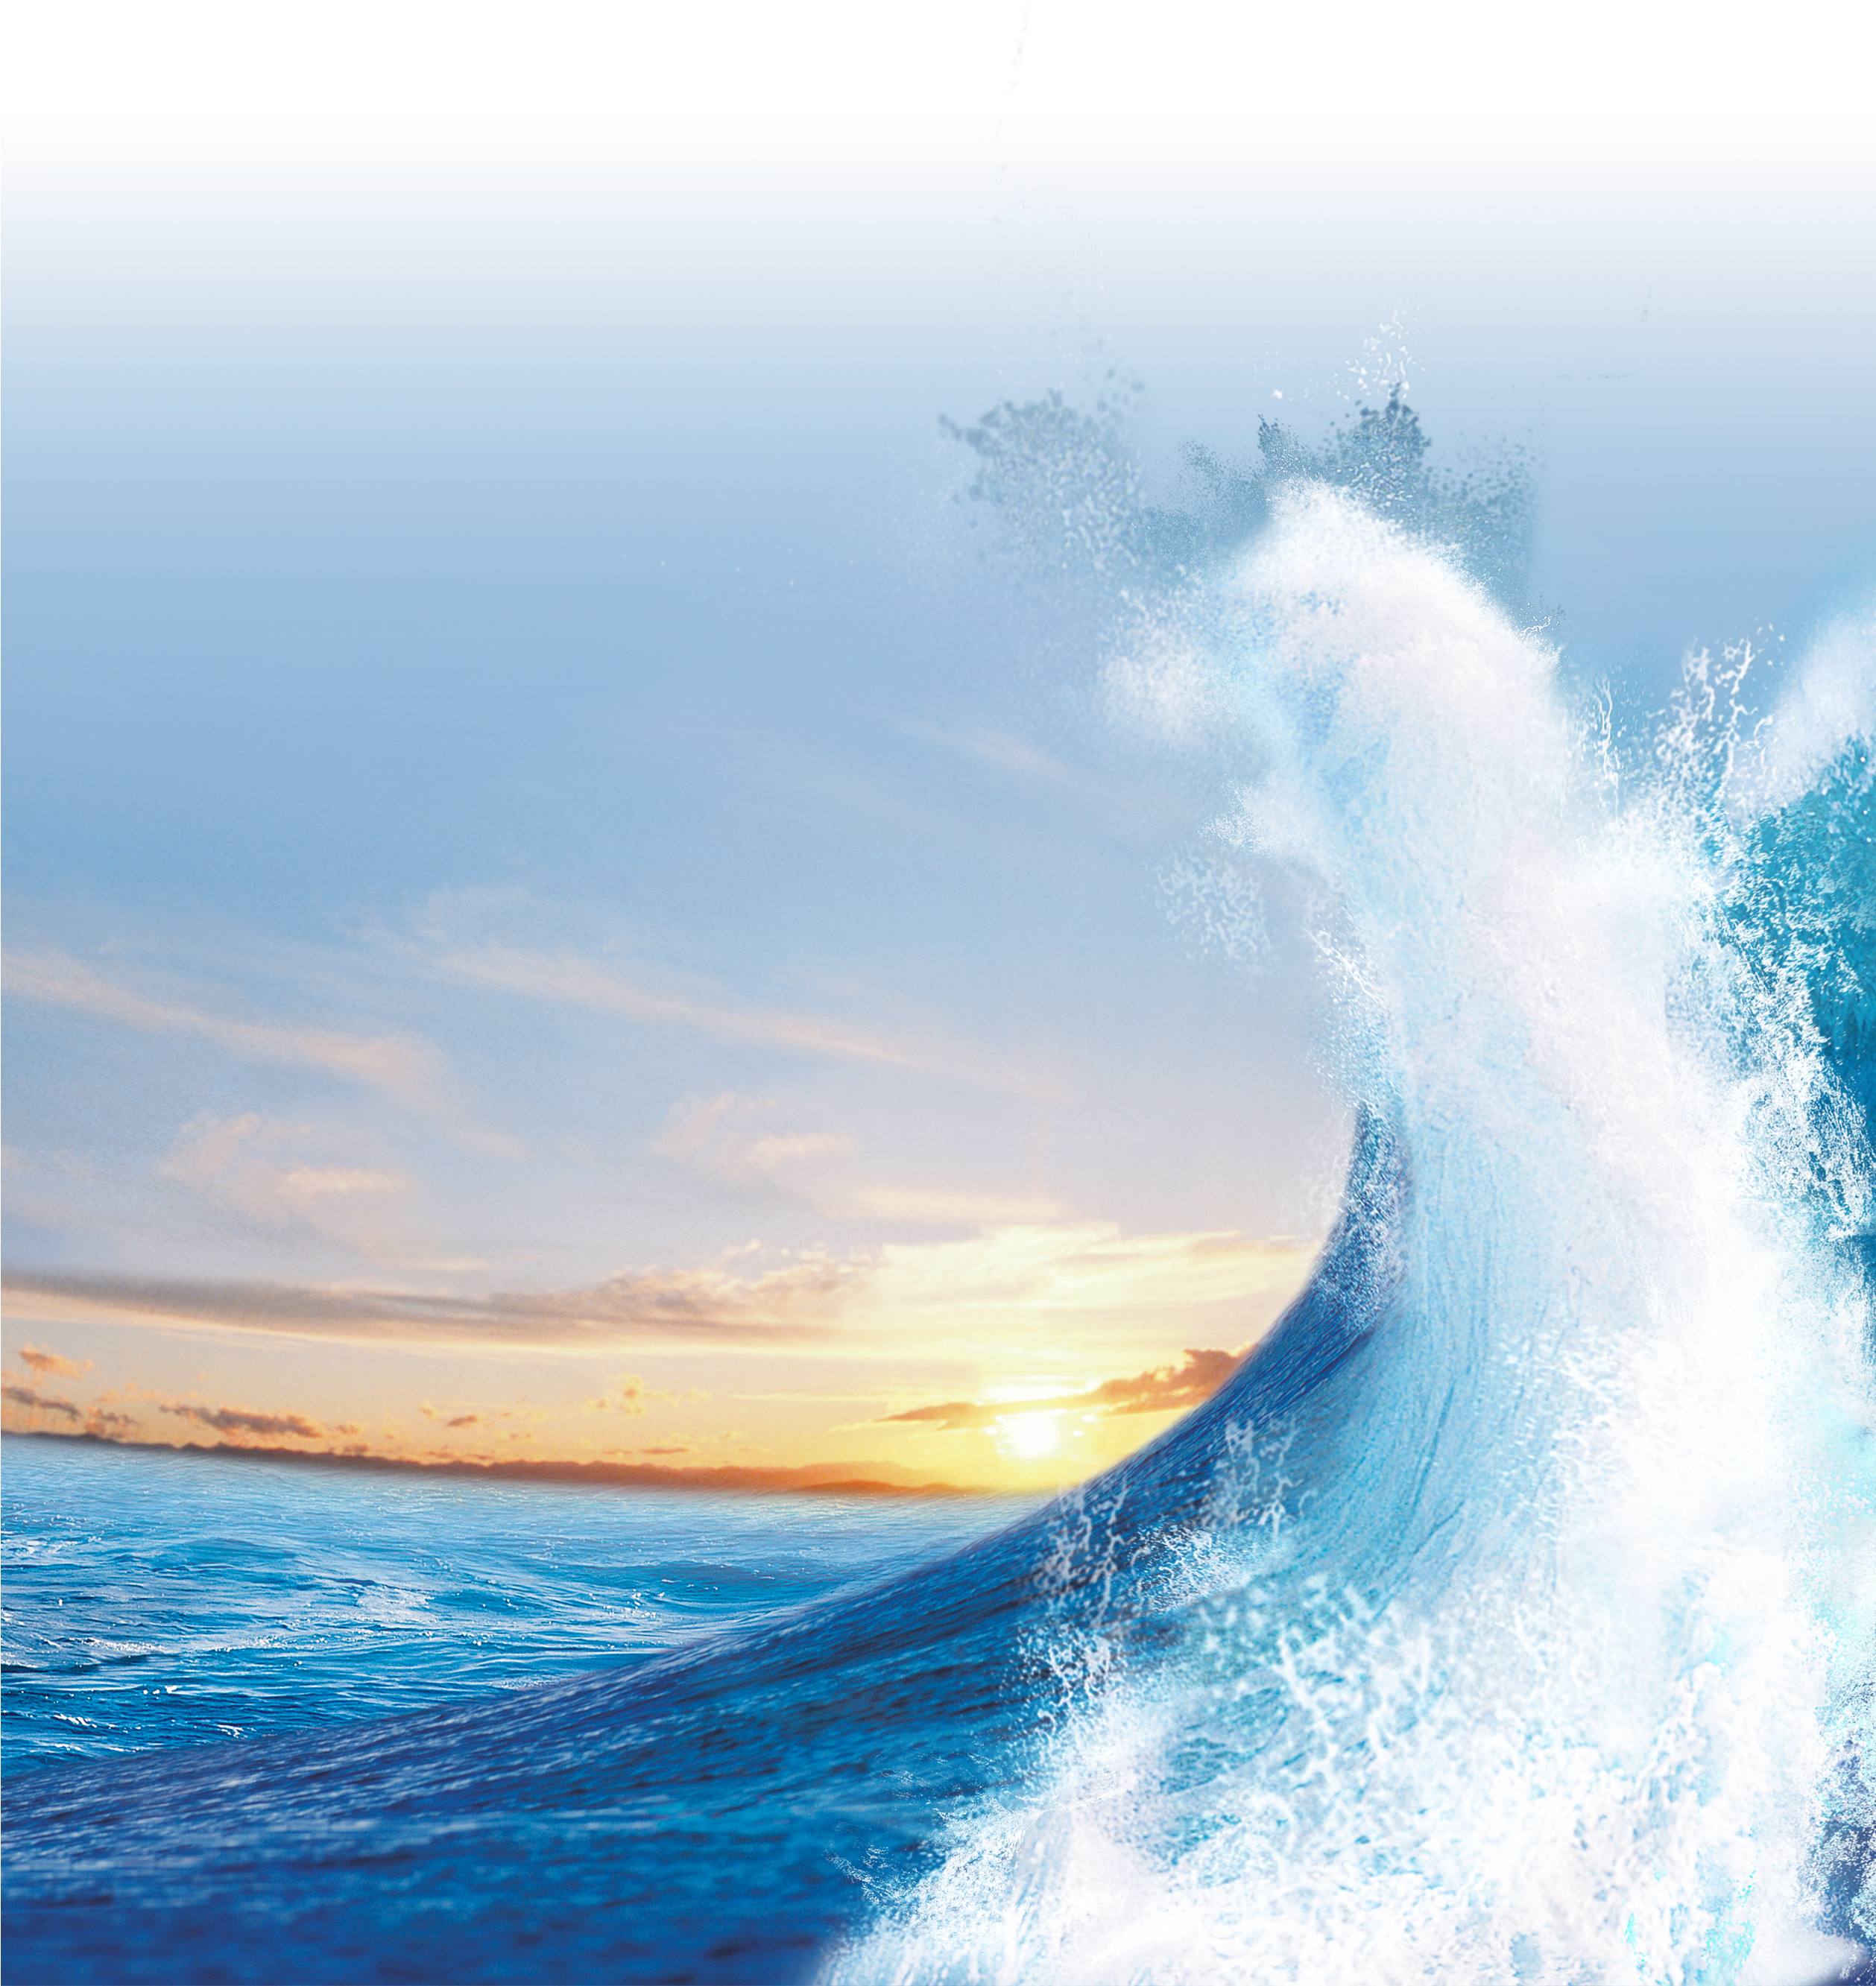 Hd blue light wave. Waves clipart sunset